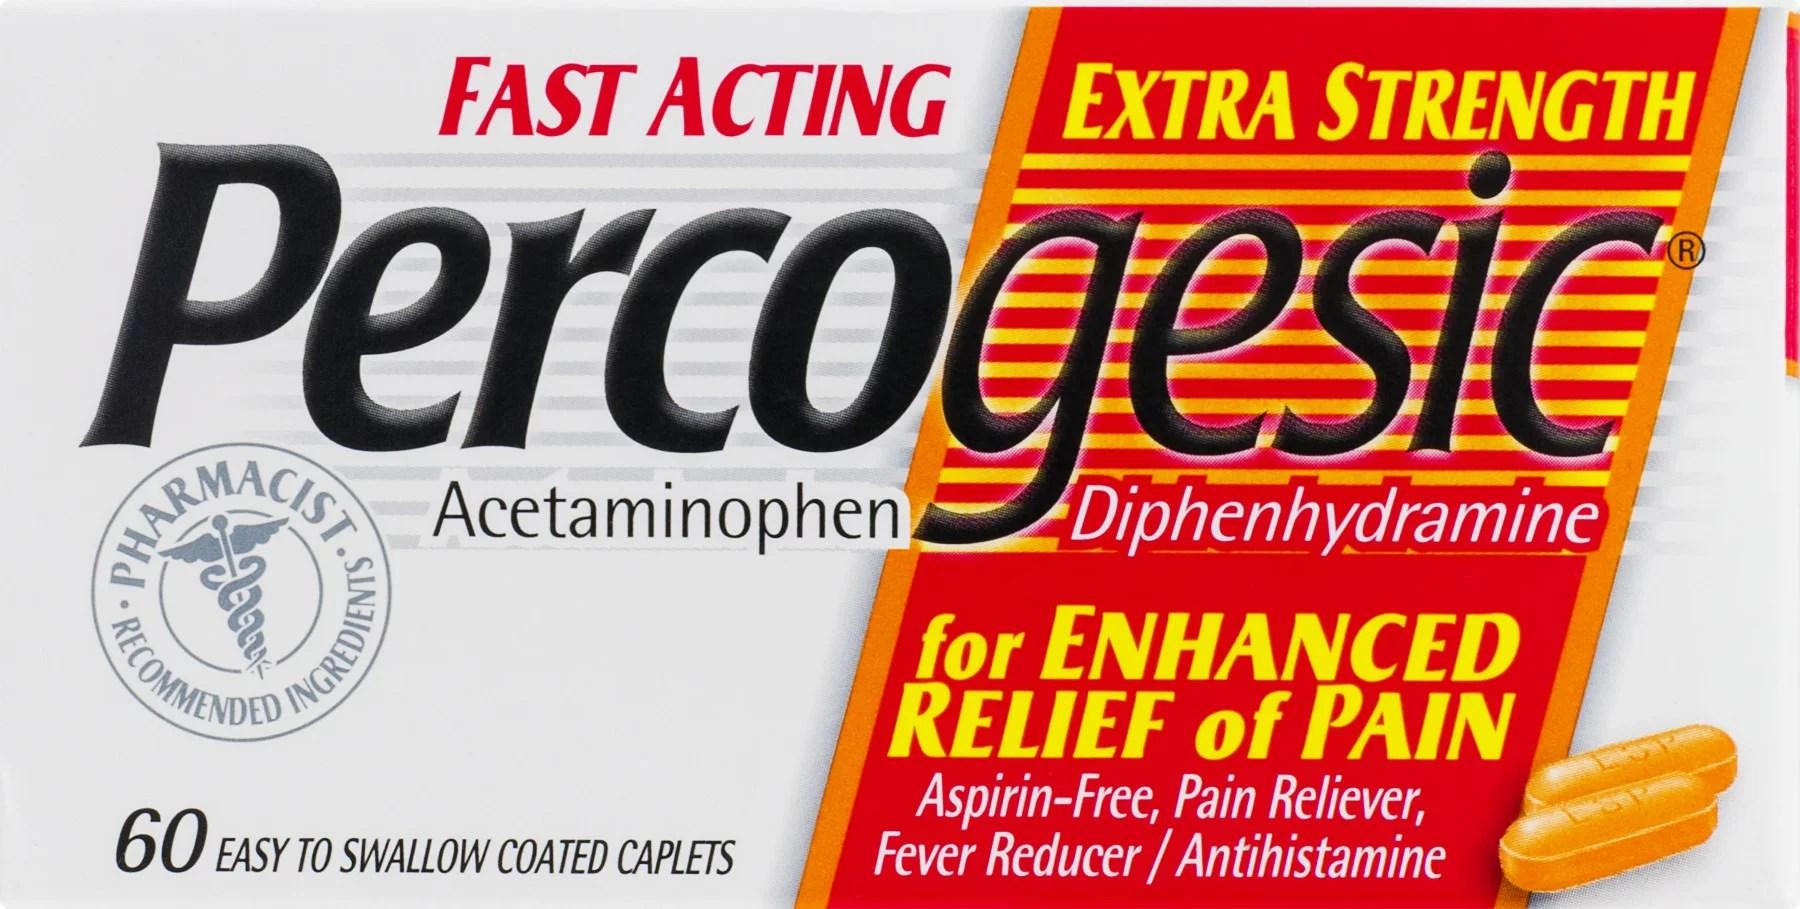 Percogesic Extra Strength 60 Ct Tablet - Walmart.com